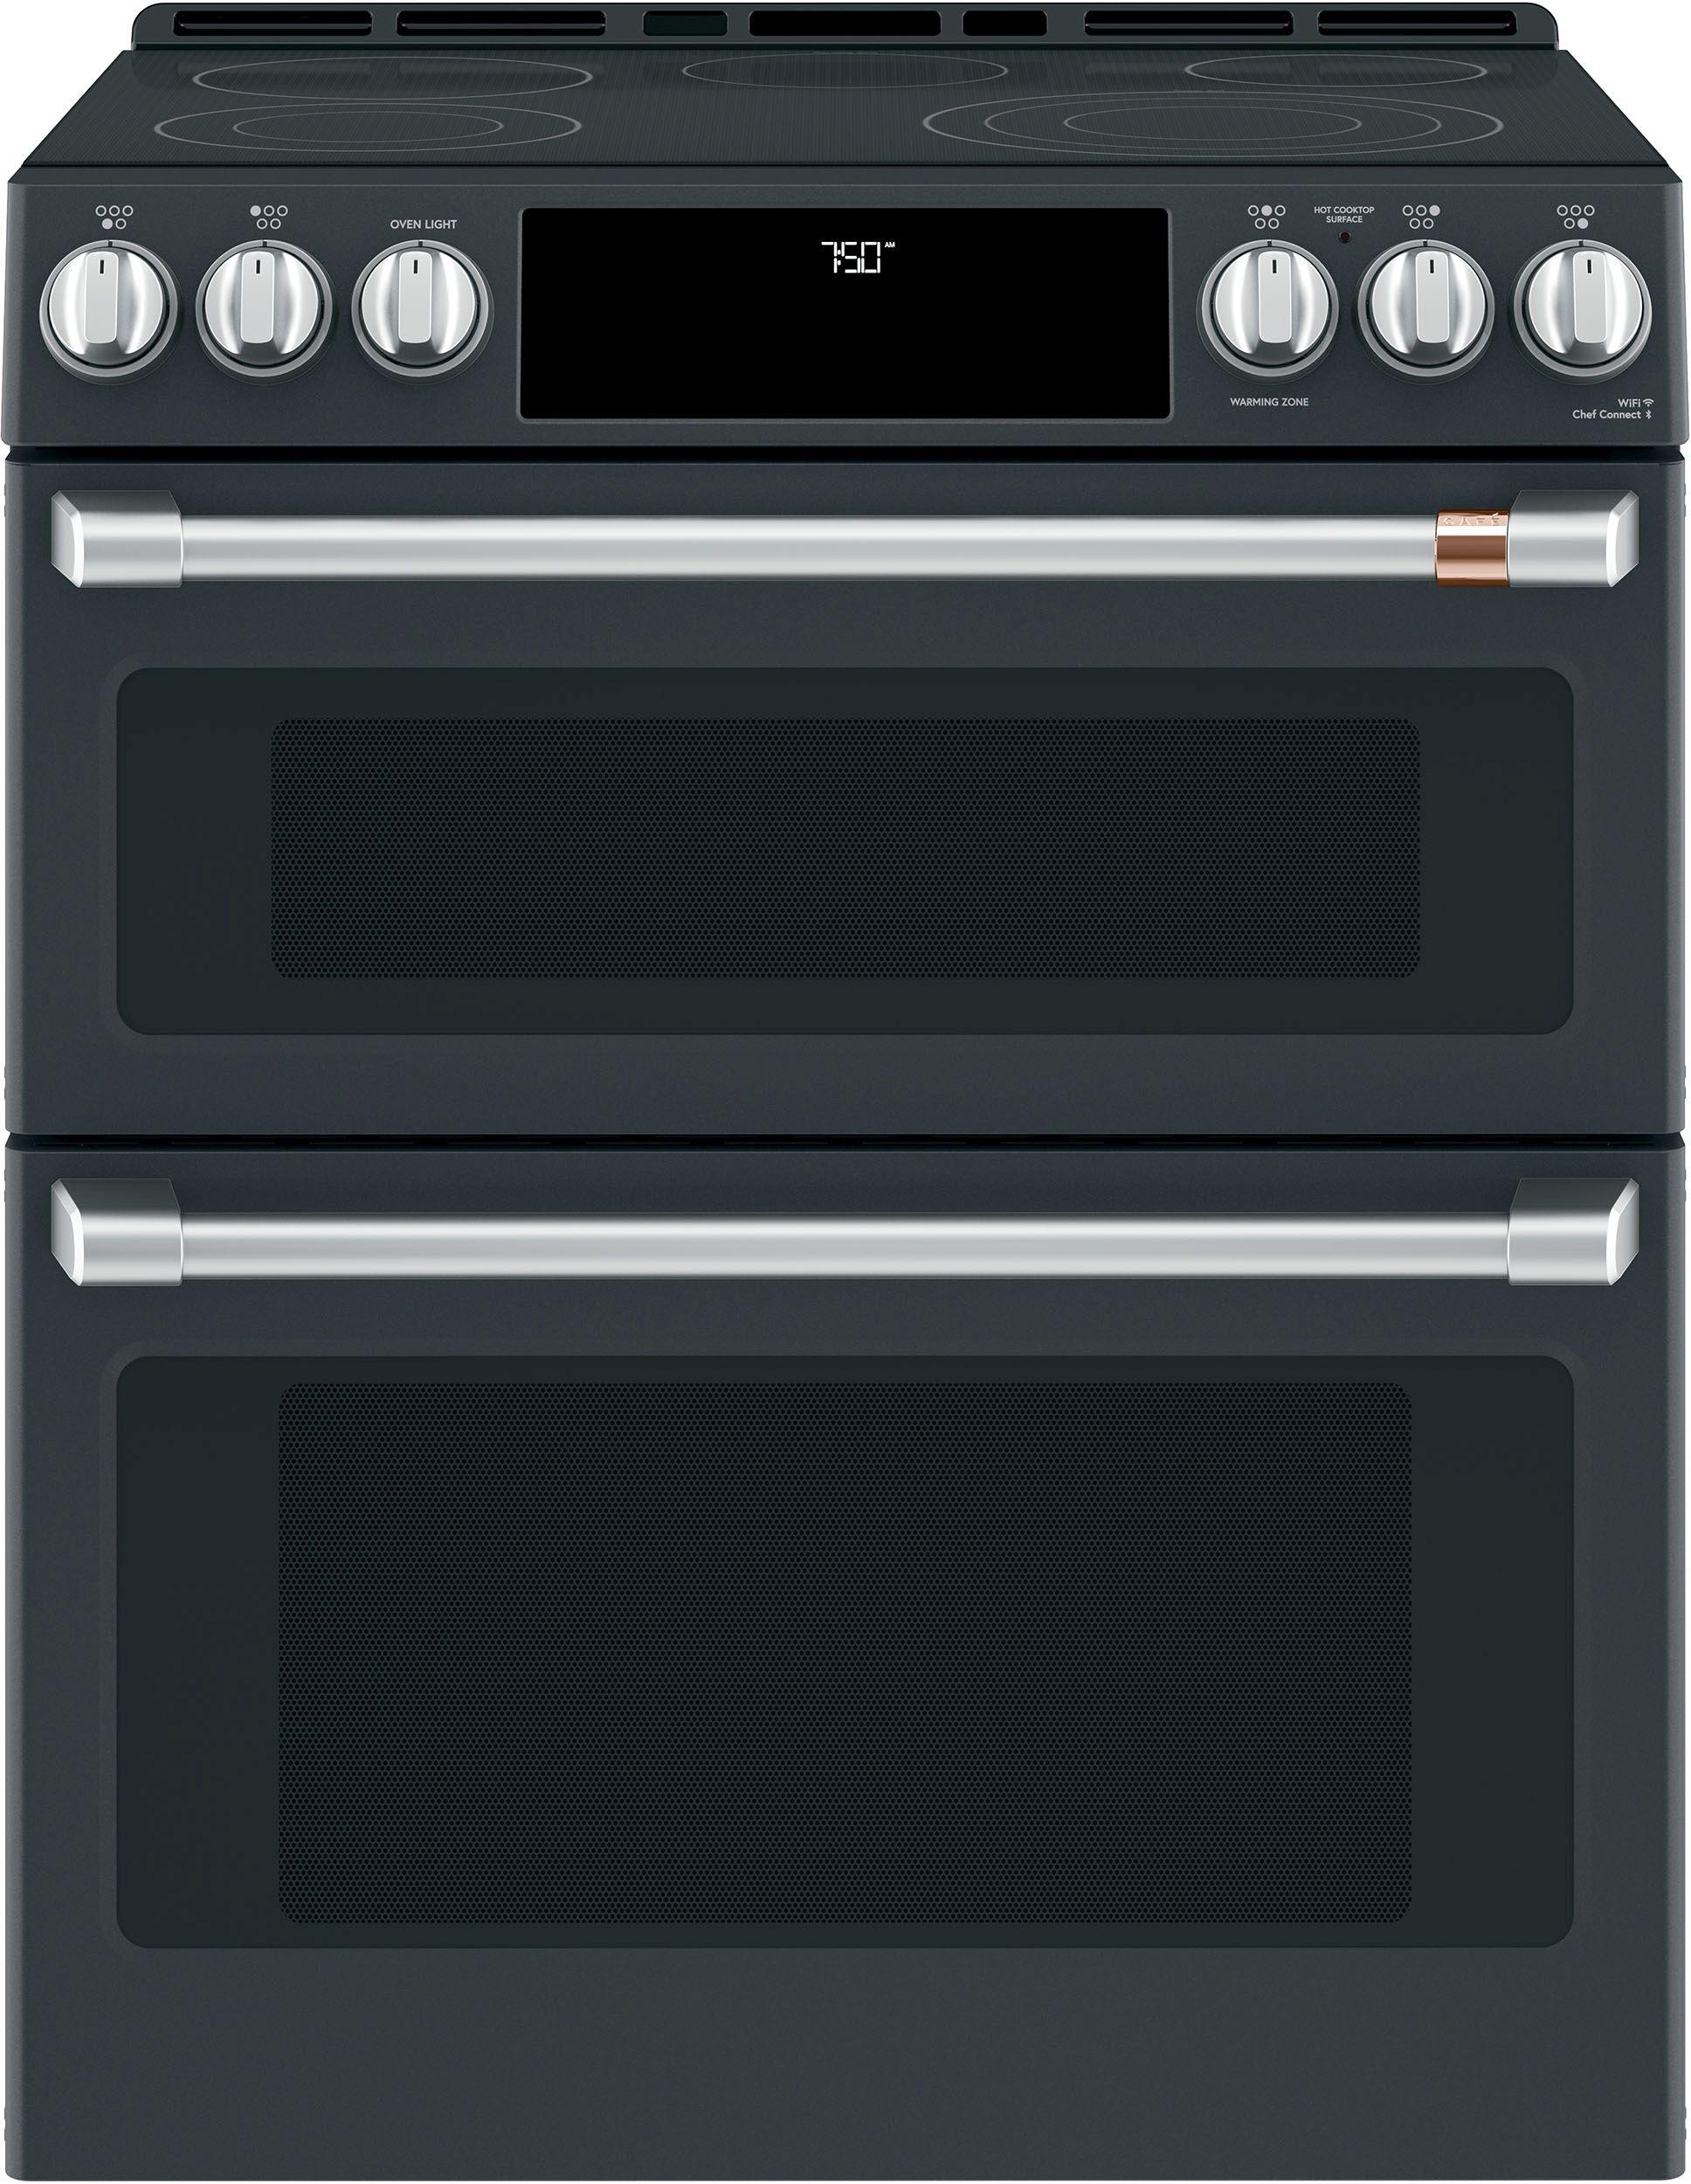 café 30 slide in double oven electric range matte black